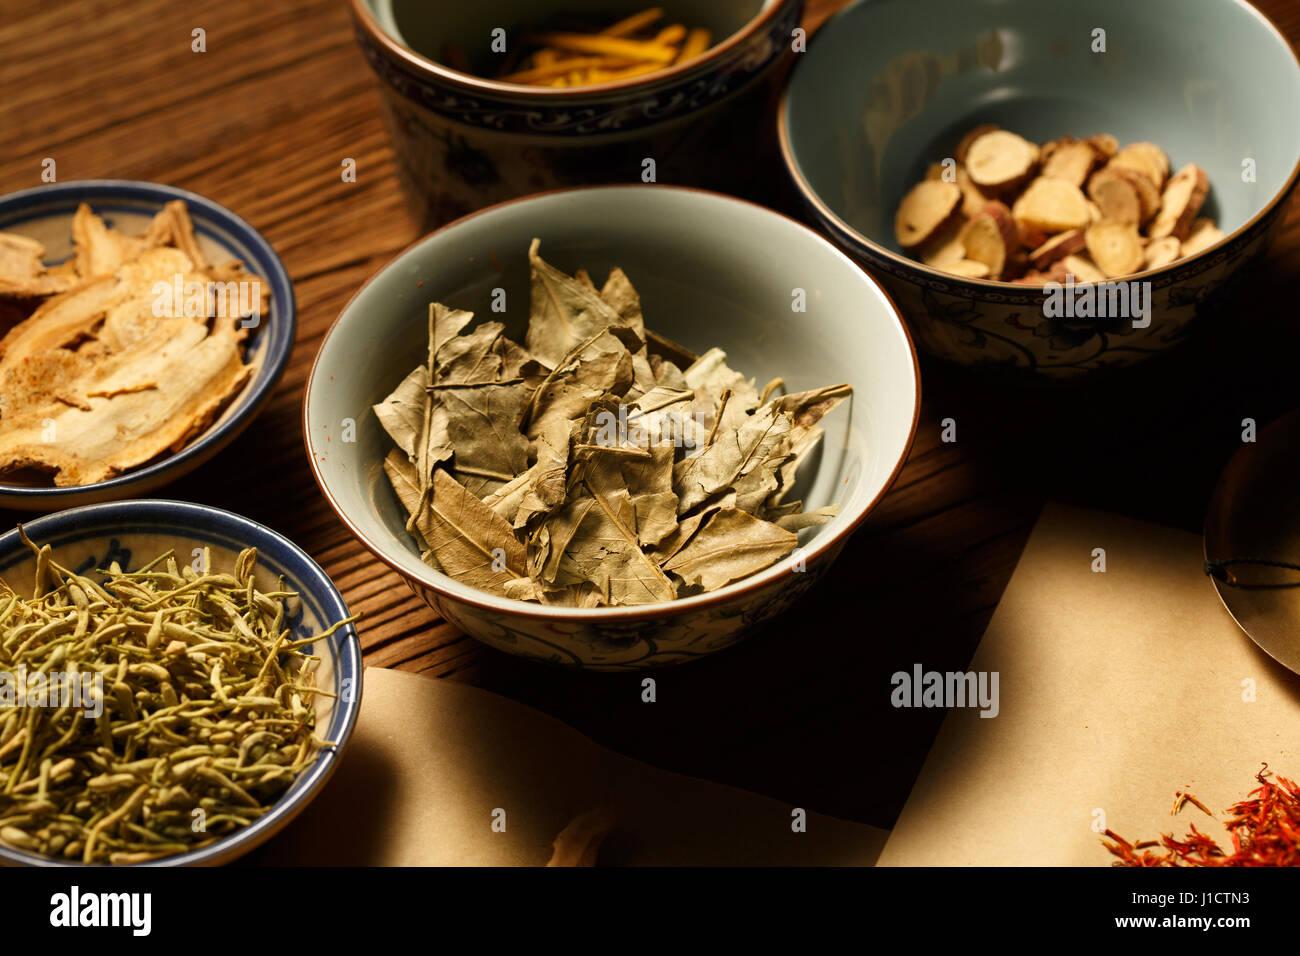 Chinese herbal medicine - Stock Image